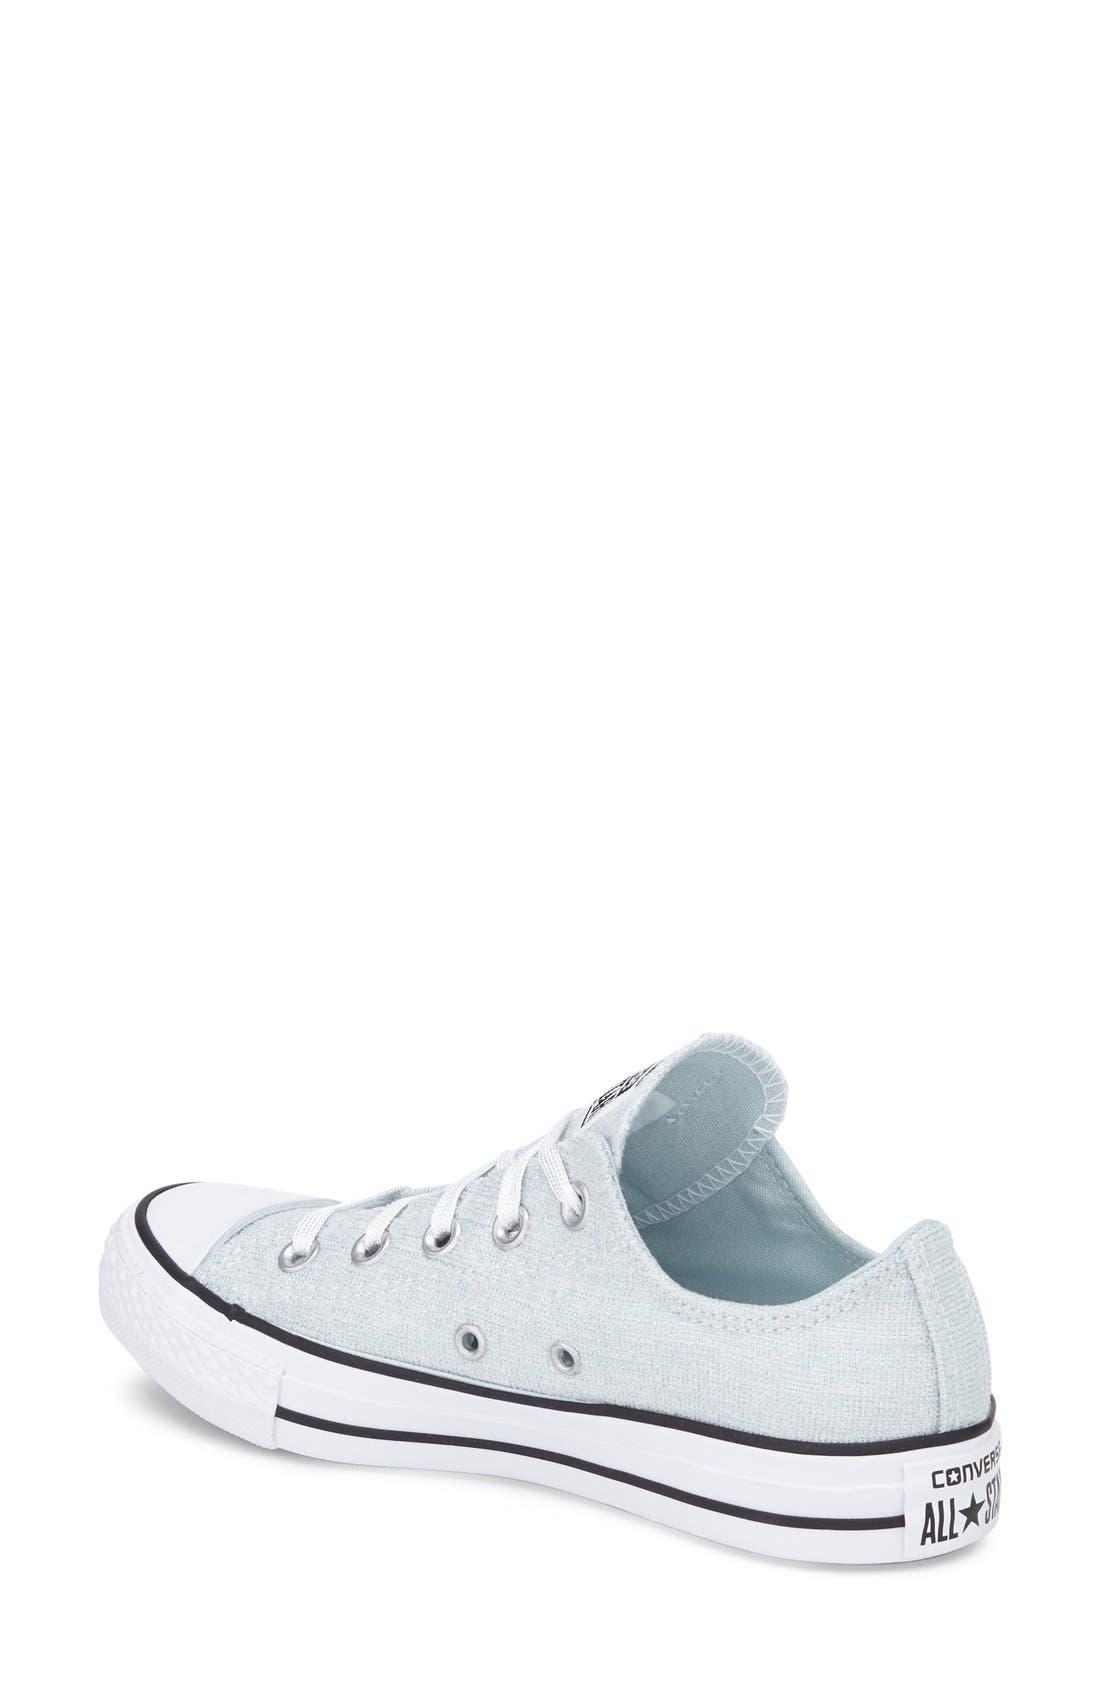 Alternate Image 2  - Converse Chuck Taylor® All Star® Chuck Ox Knit Low Top Sneaker (Women)